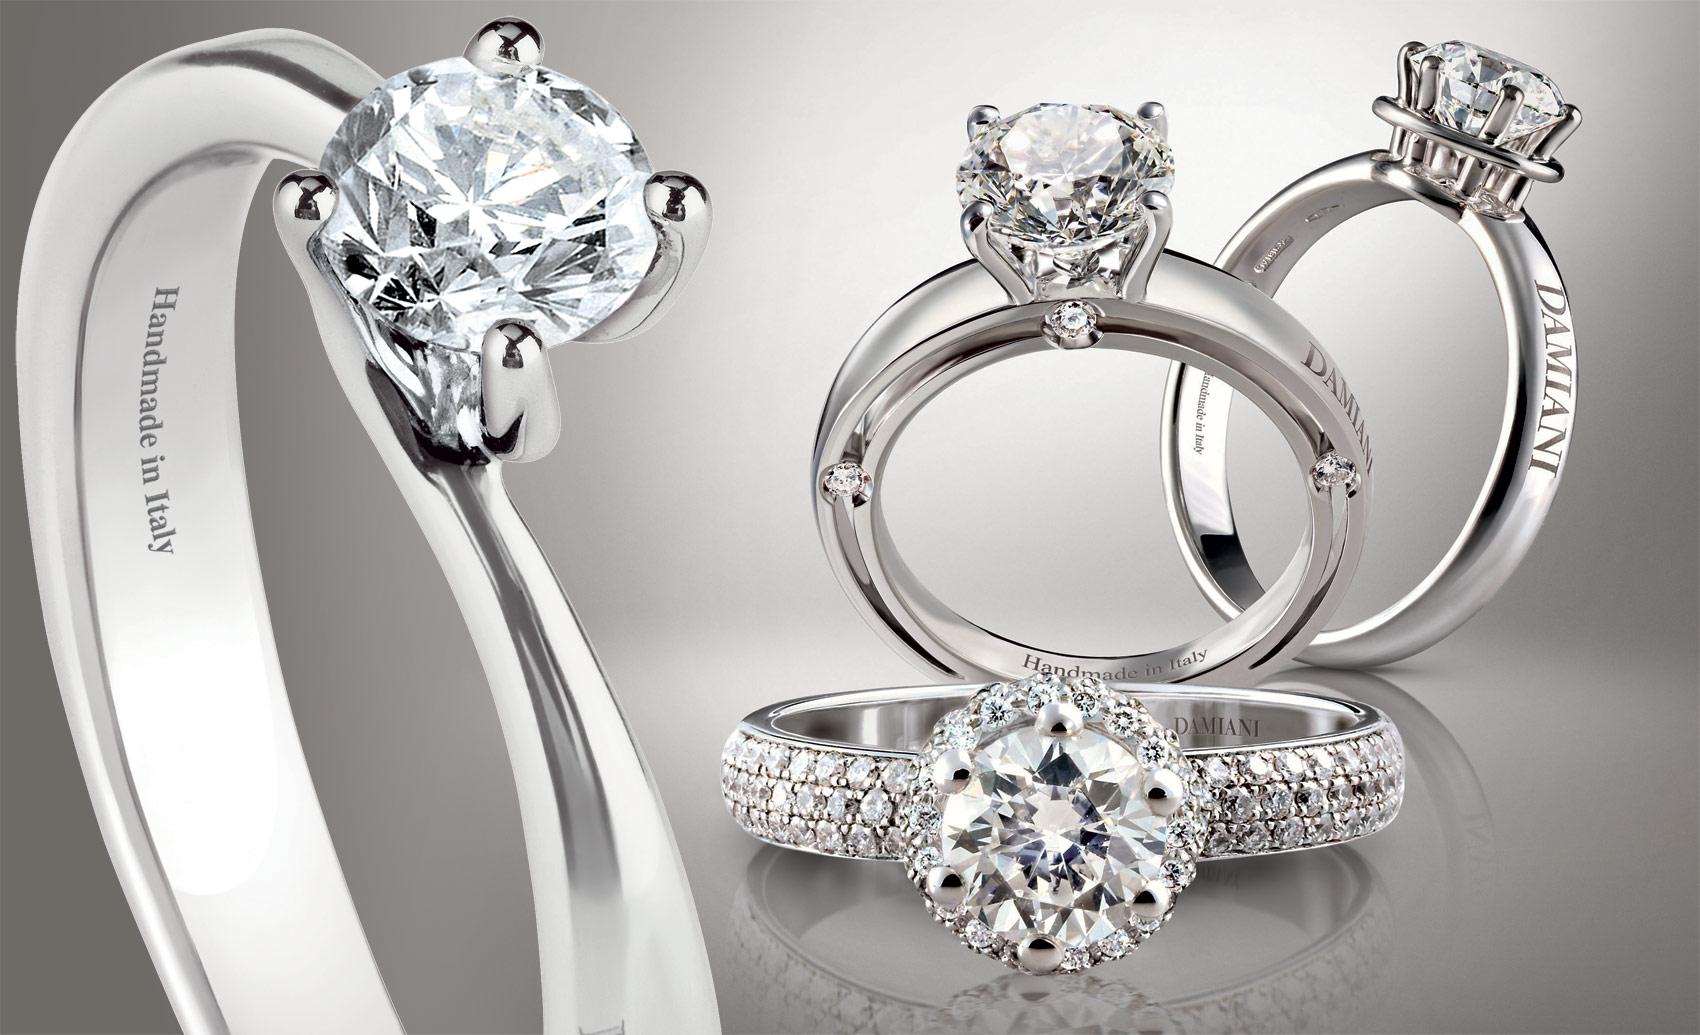 Exploring The Sparkling Allure Of Damiani's Diamonds